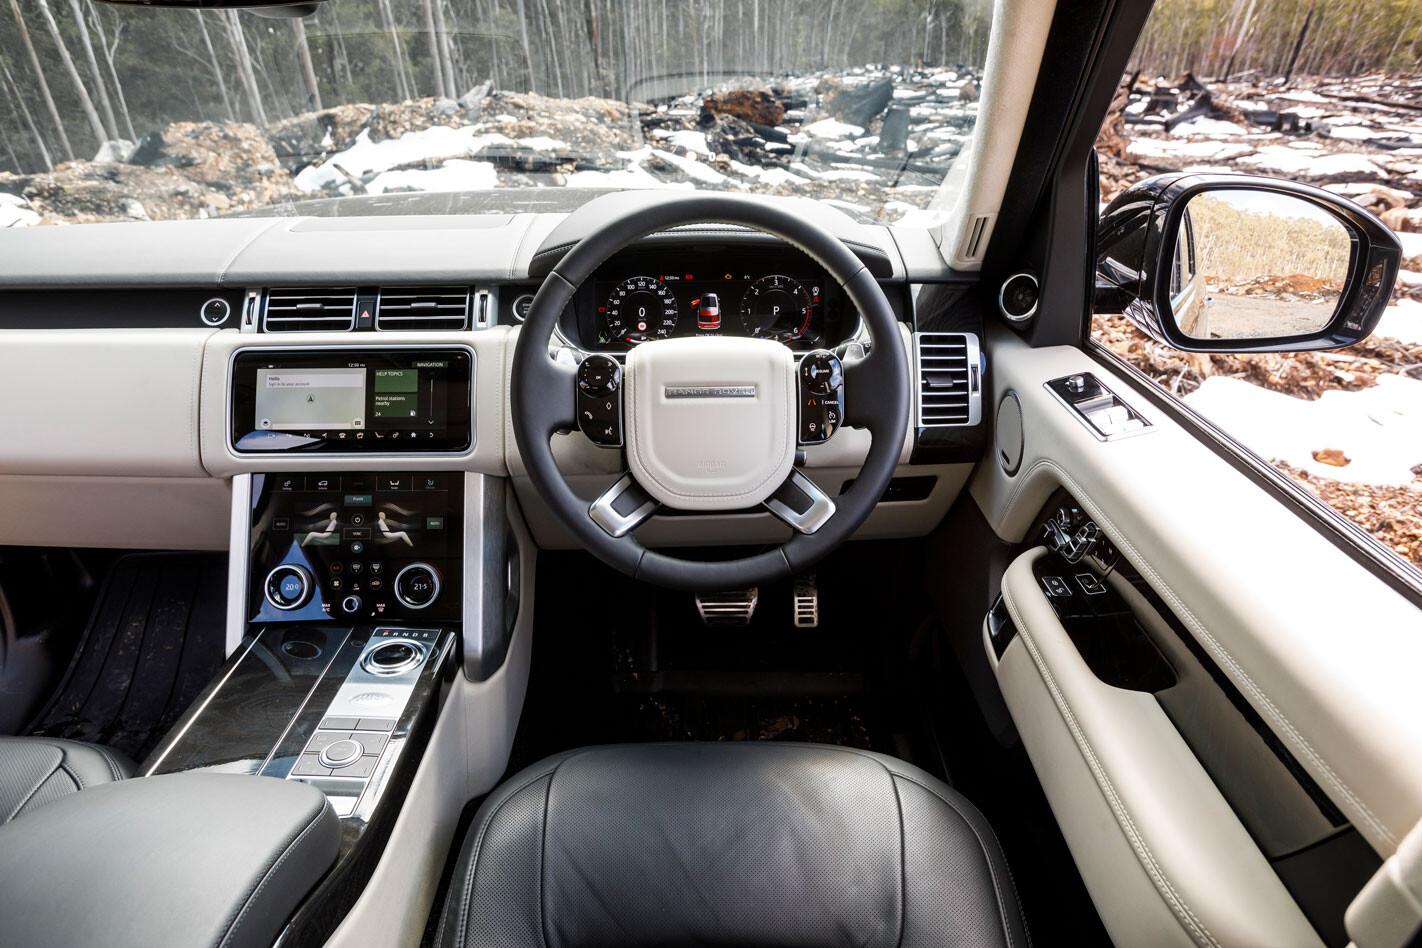 2018 Range Rover SDV8 interior